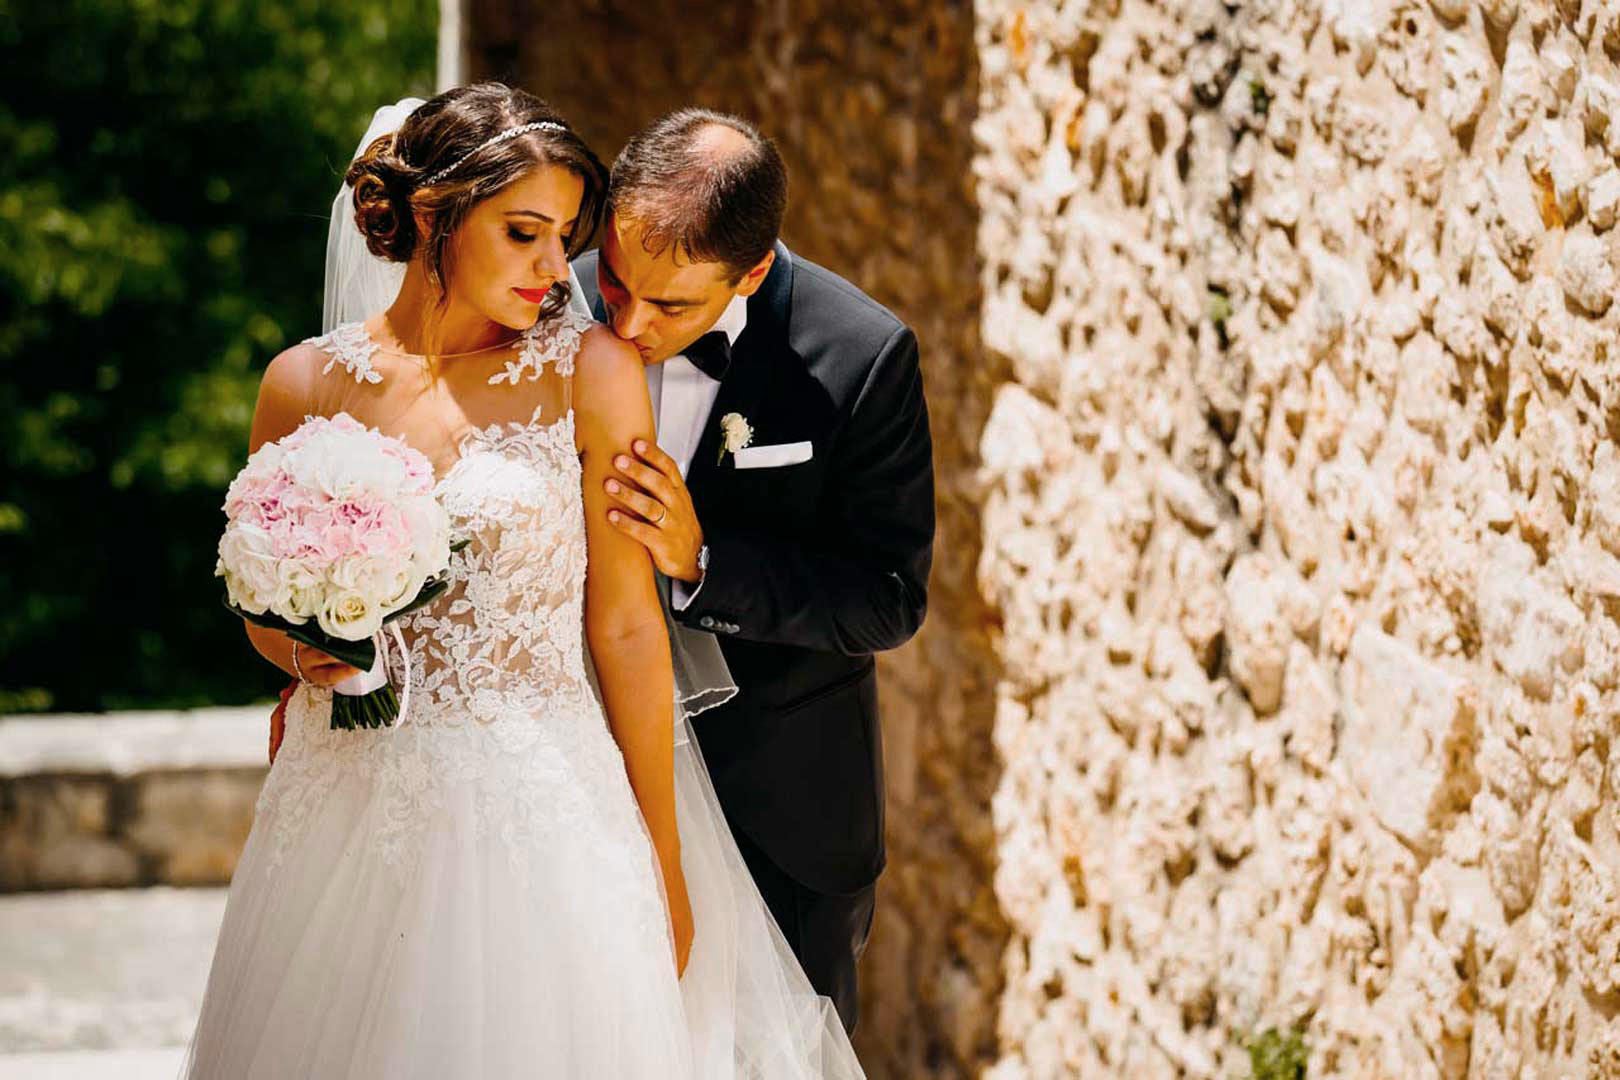 025-matrimonio-elegante-gianni-lepore-fotografo